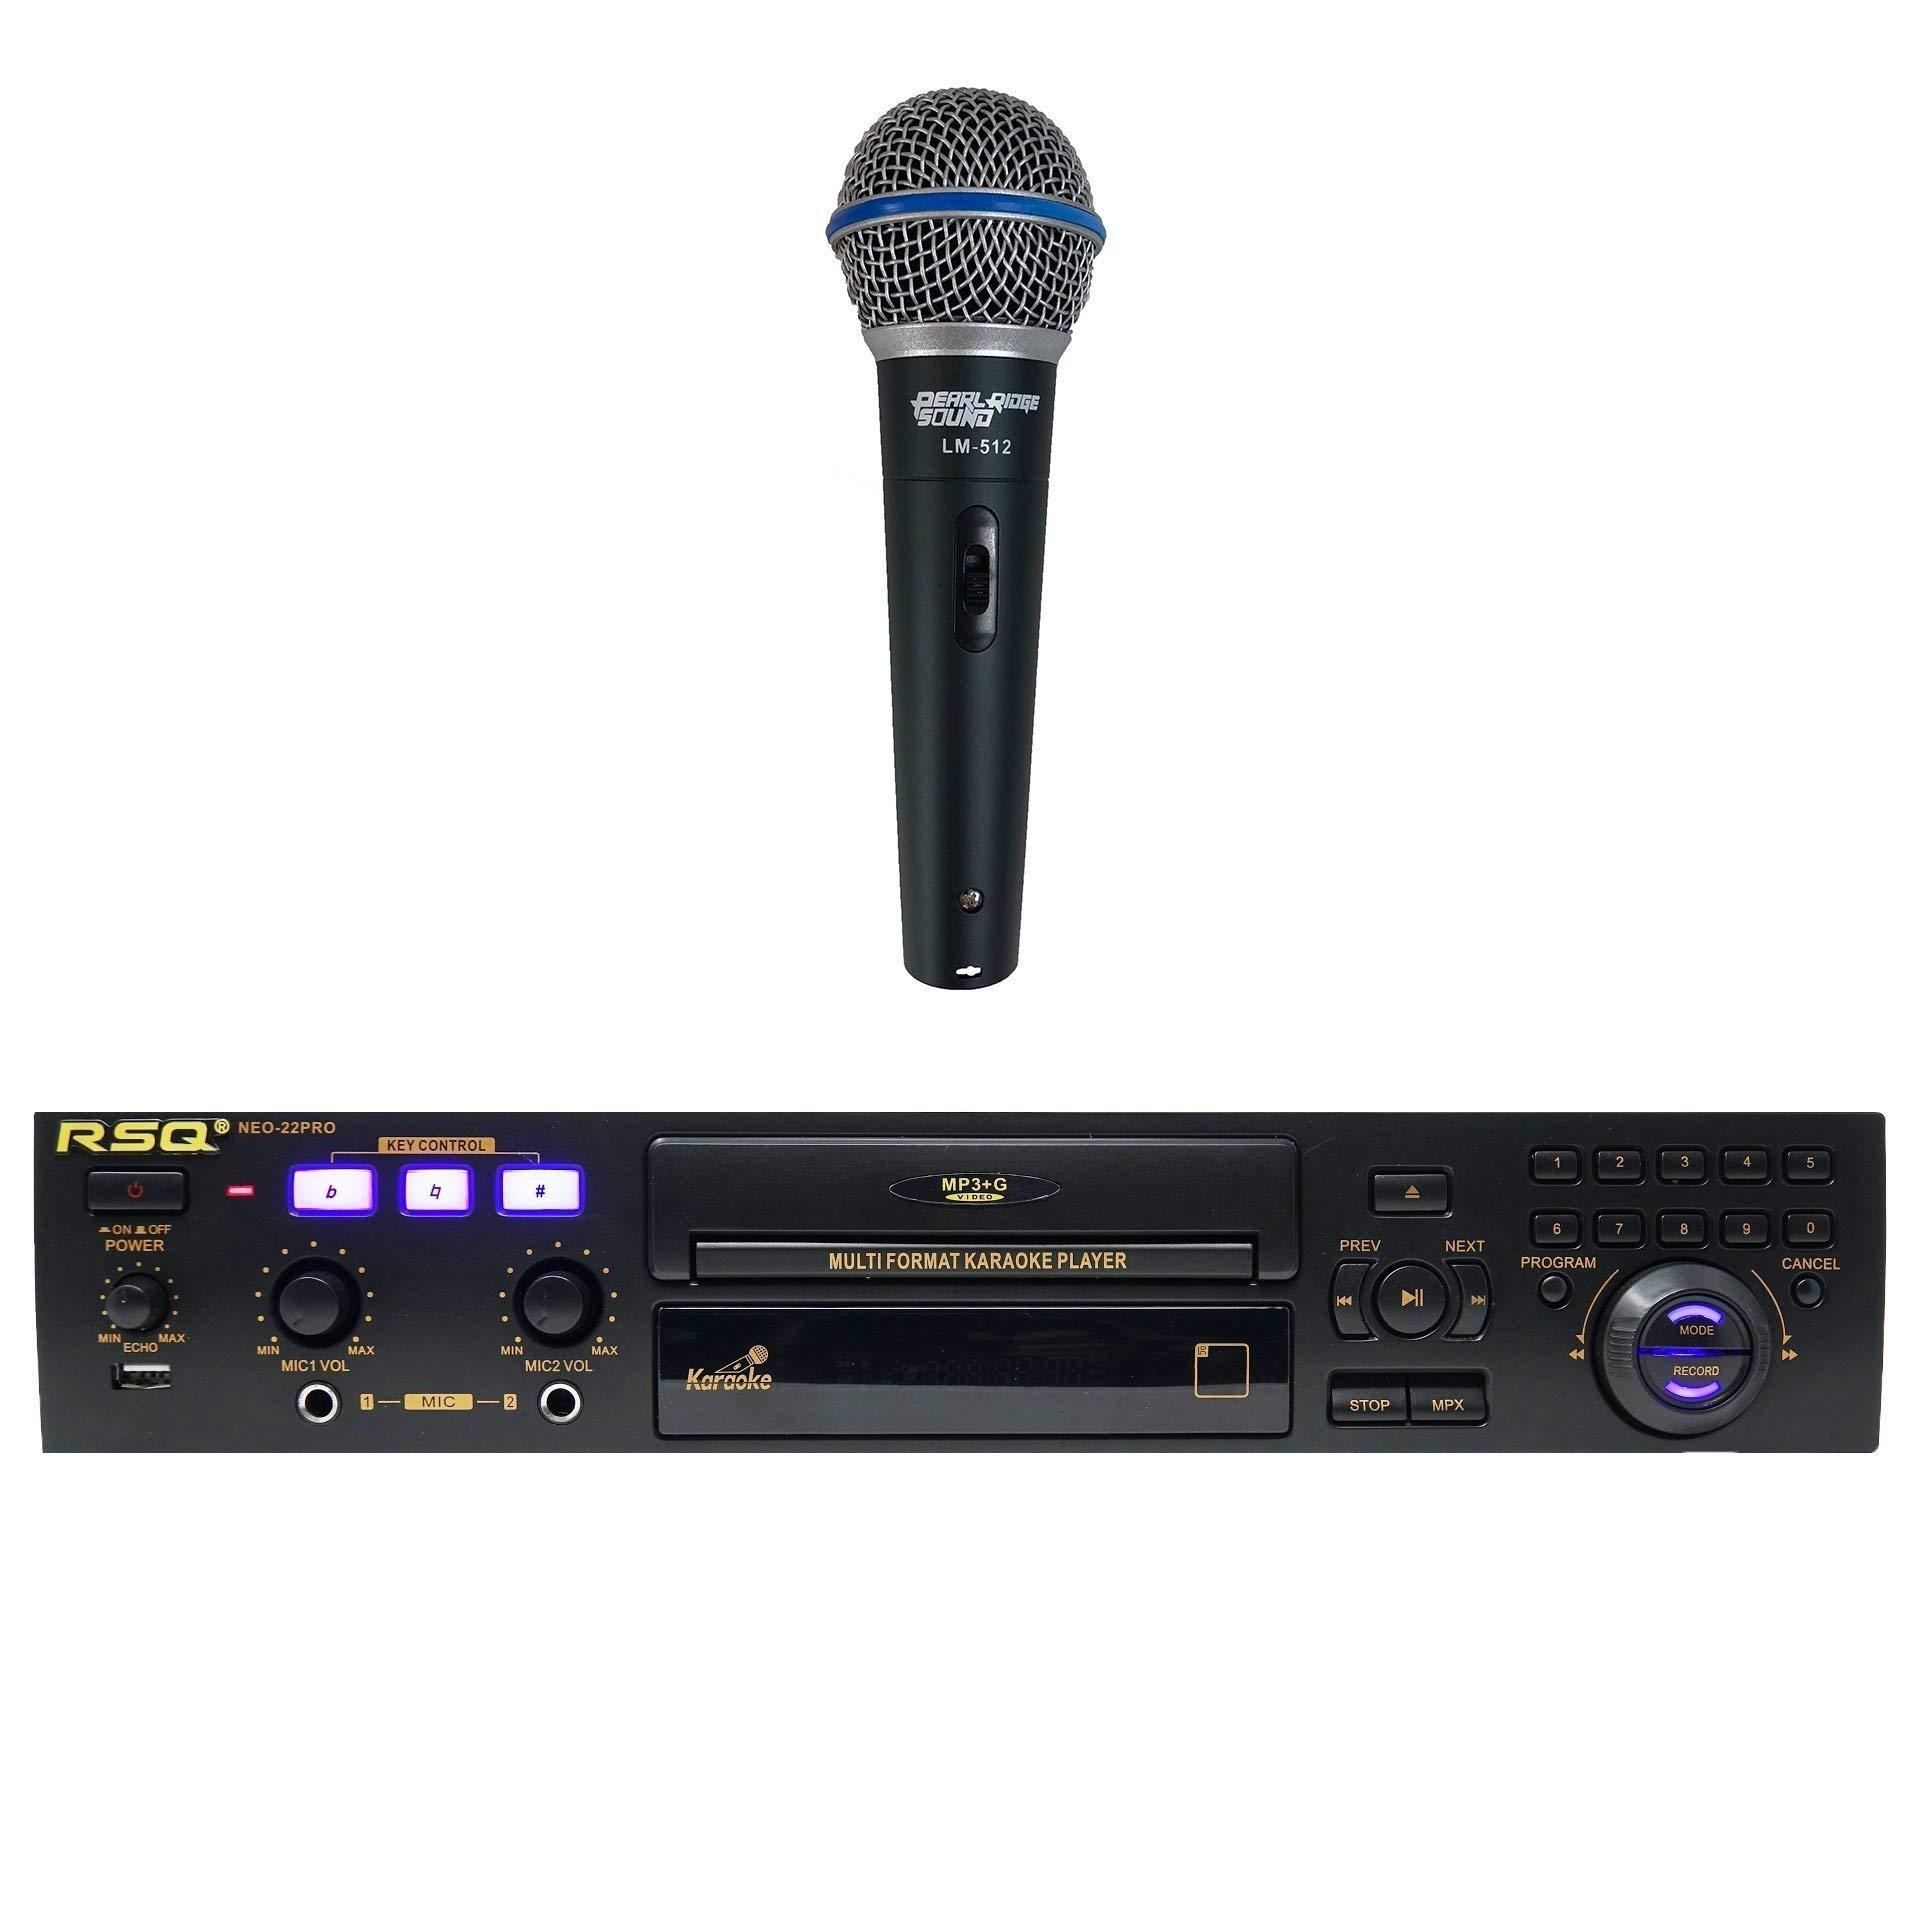 RSQ NEO 22 PRO Series 2 Digital Bluetooth Karaoke 500 Free Songs Player CDG Machine MP3G by RSQ (Image #1)